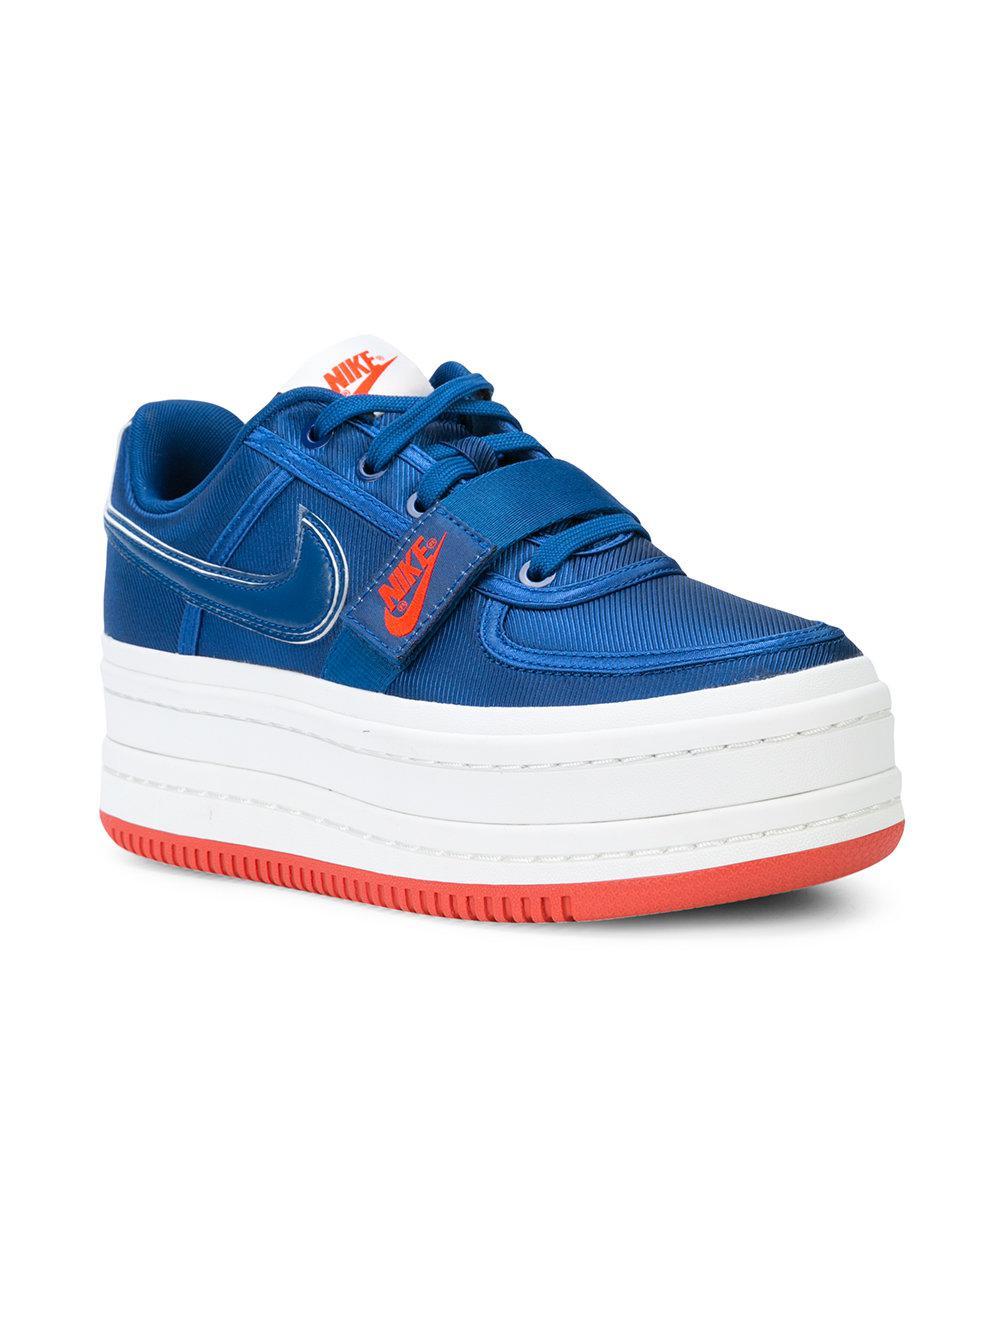 Nike Leather Vandal 2x Sneakers in Blue